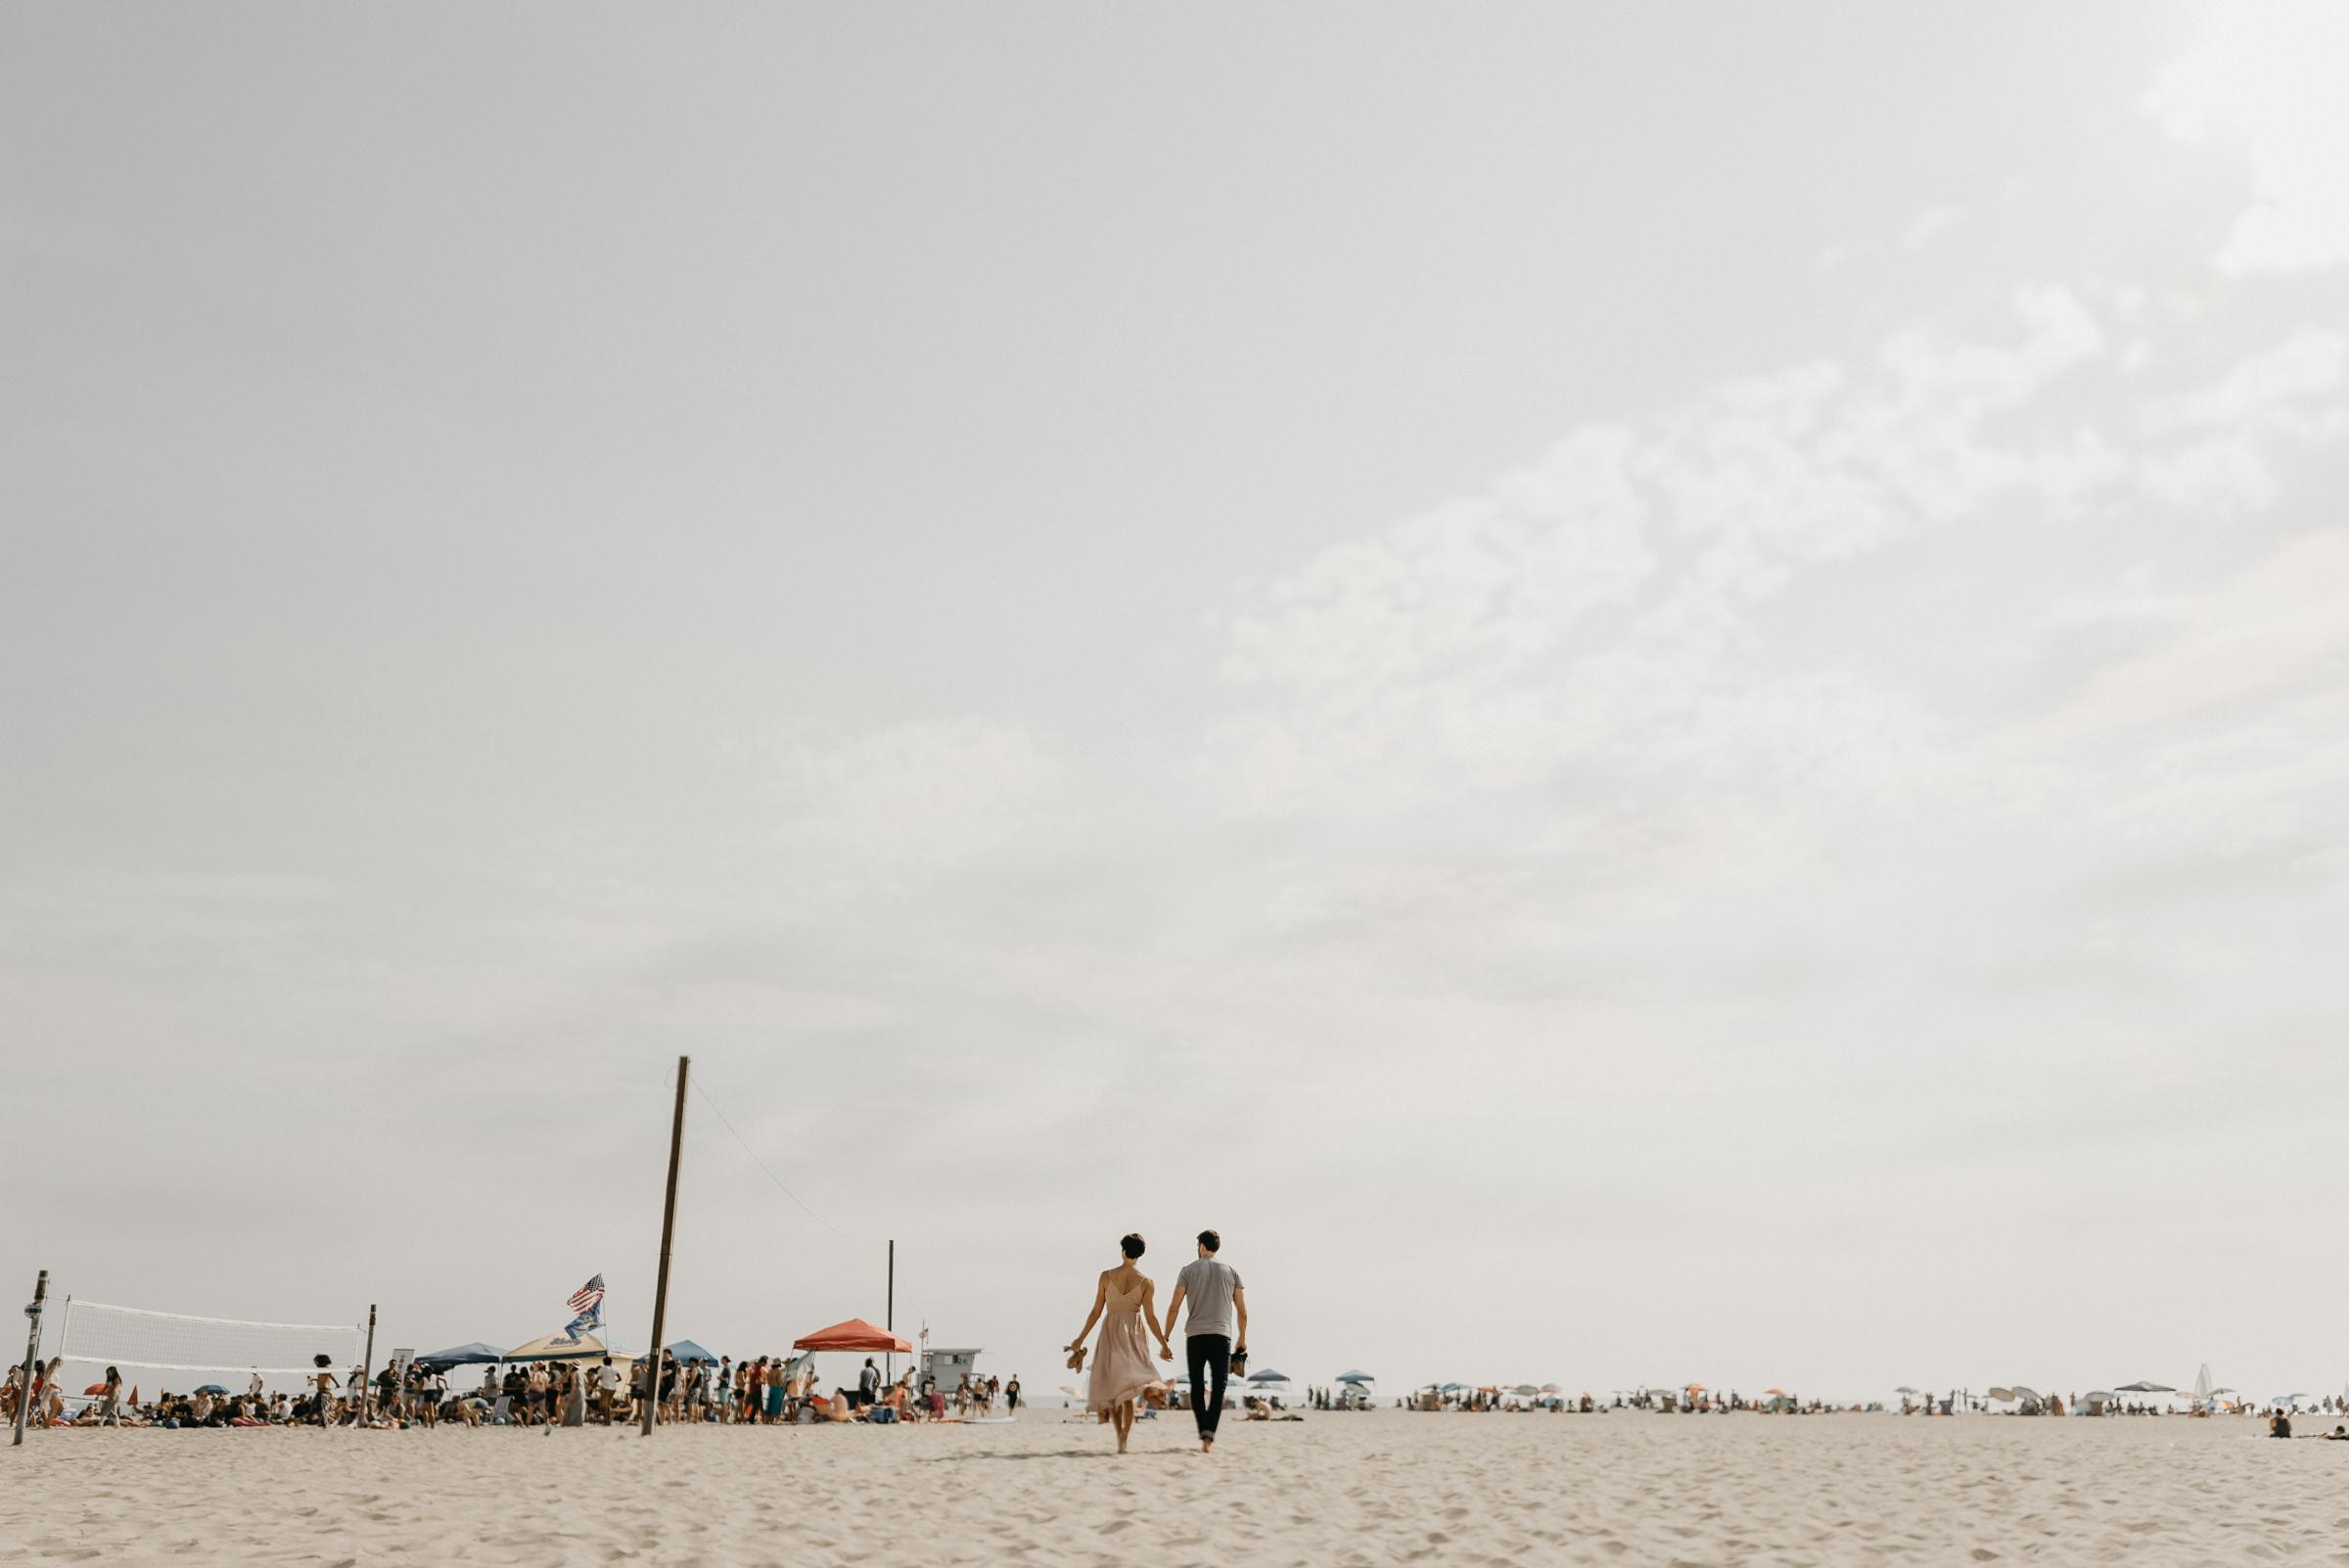 Isaiah + Taylor Photography - Venice Beach & Santa Monica Engagement Session, Los Angeles Wedding Photographer-050.jpg